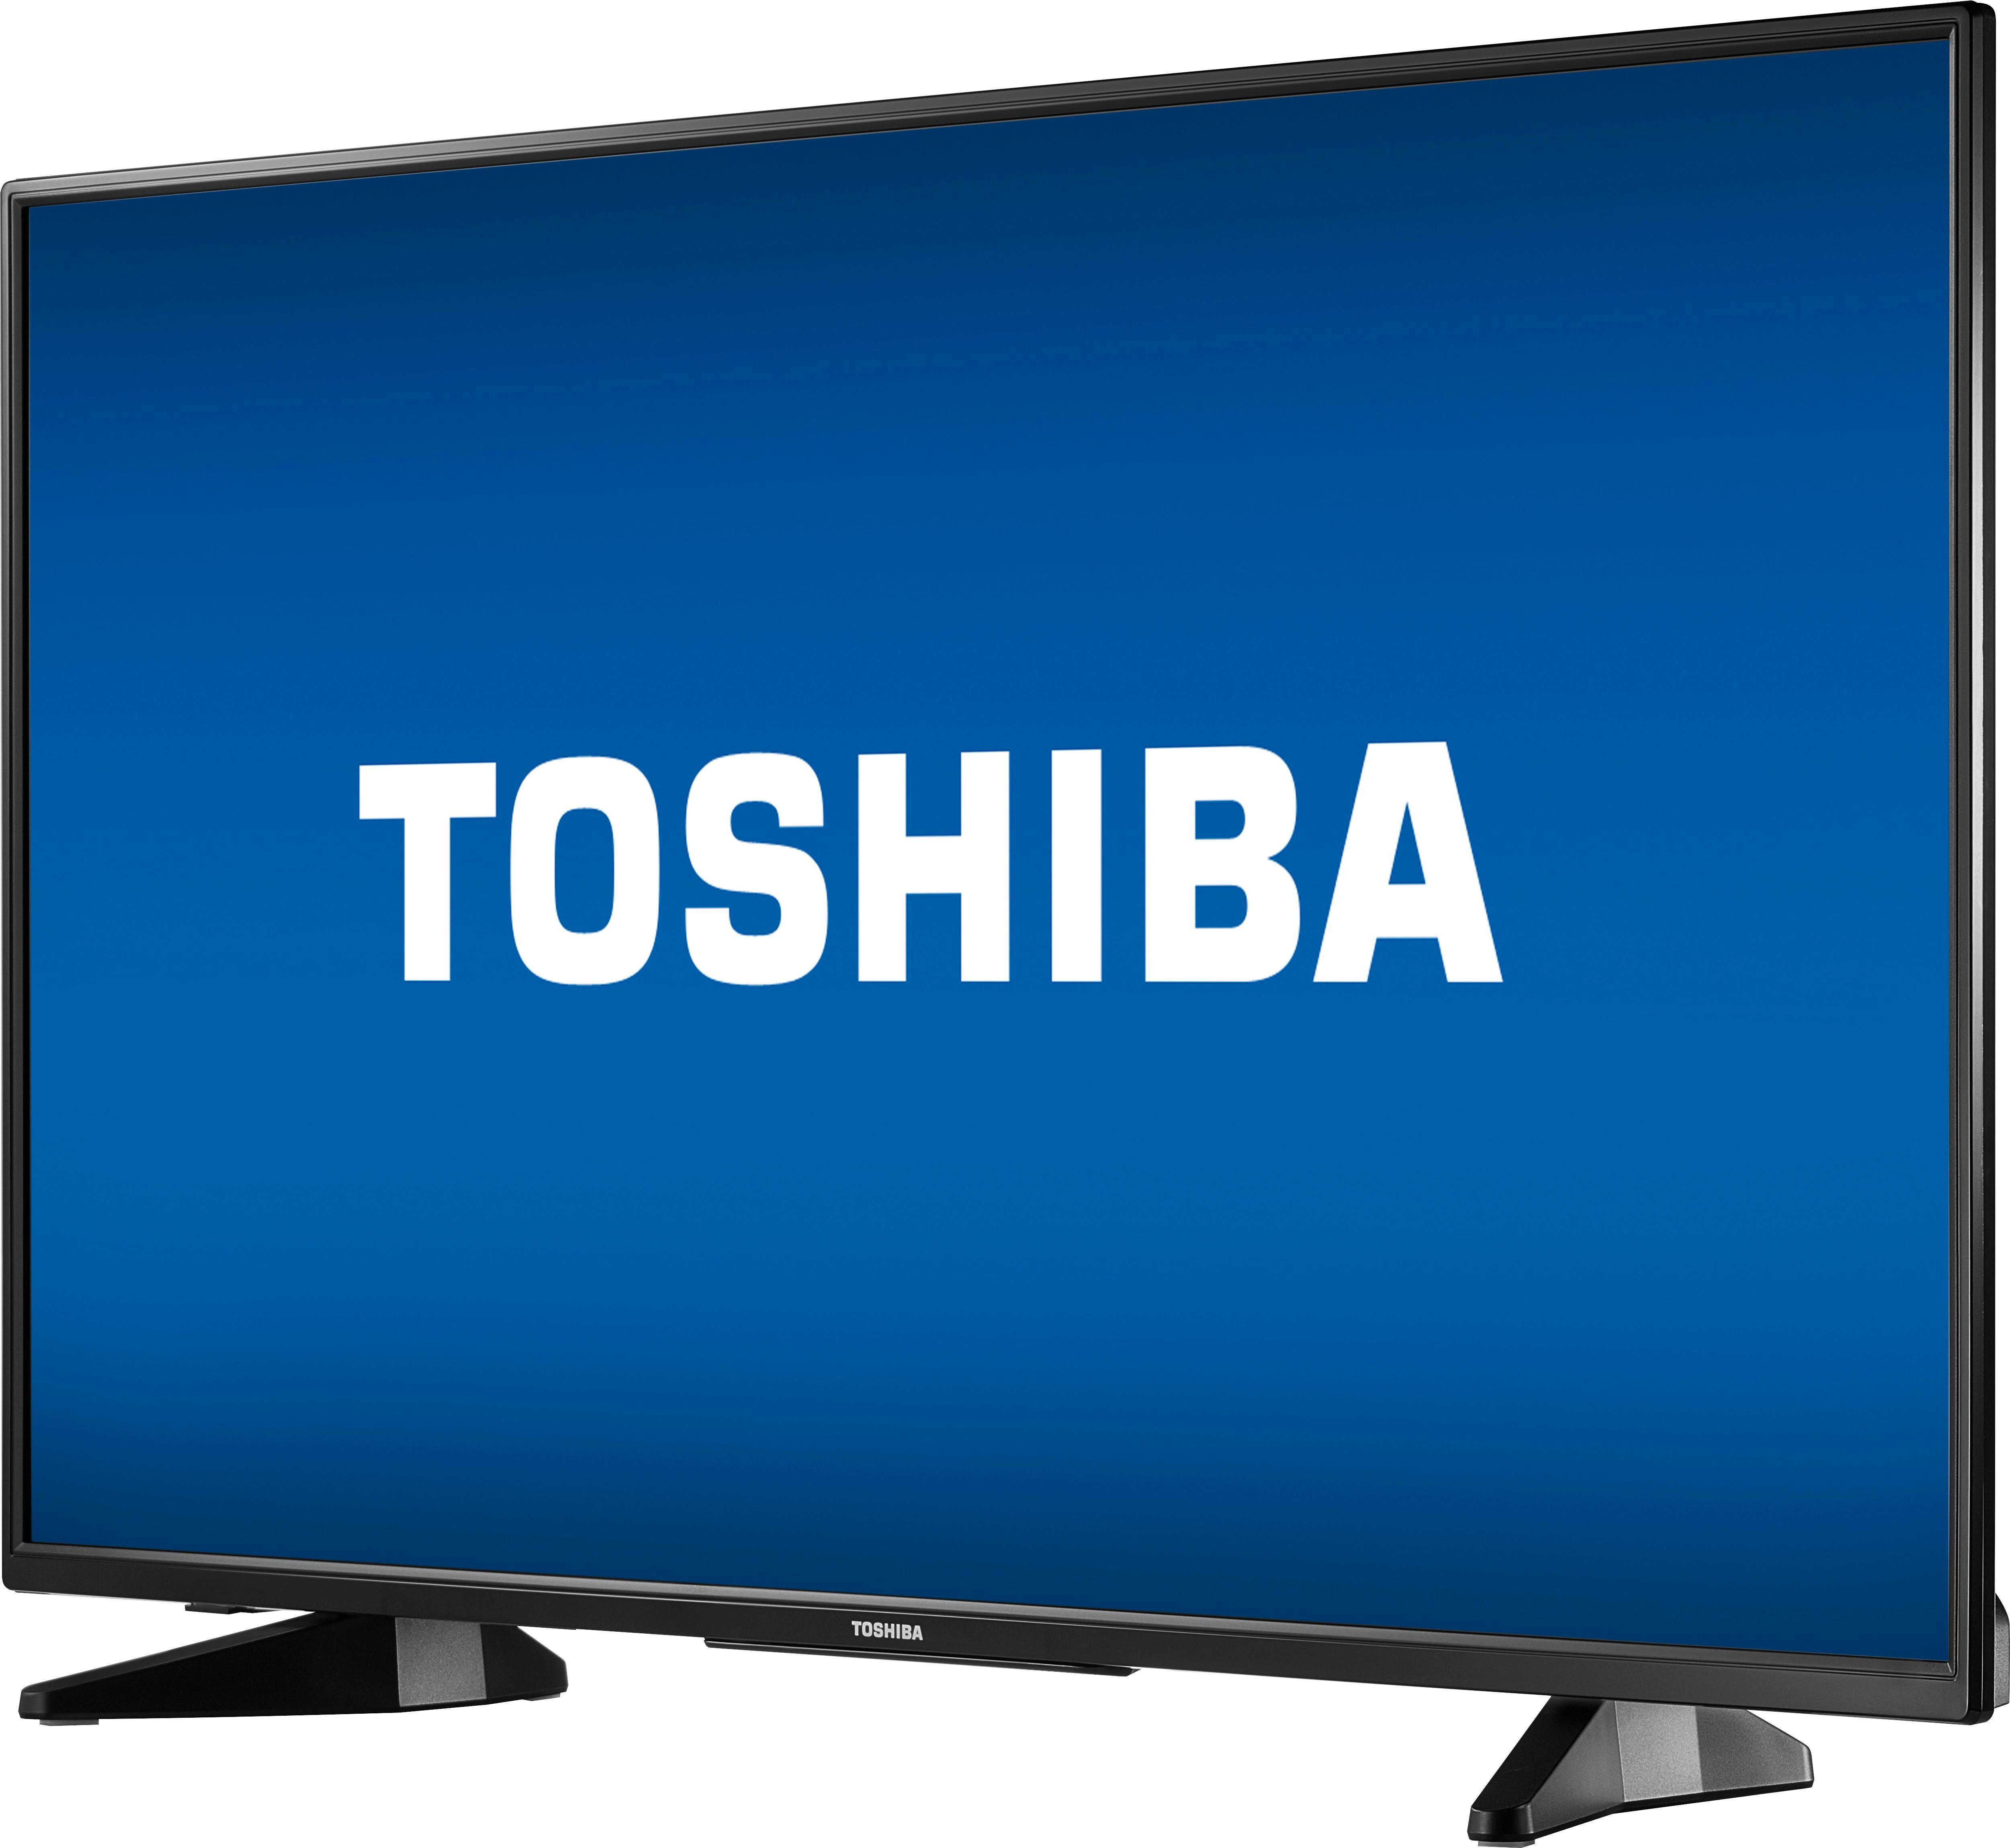 toshiba tv wiring diagrams